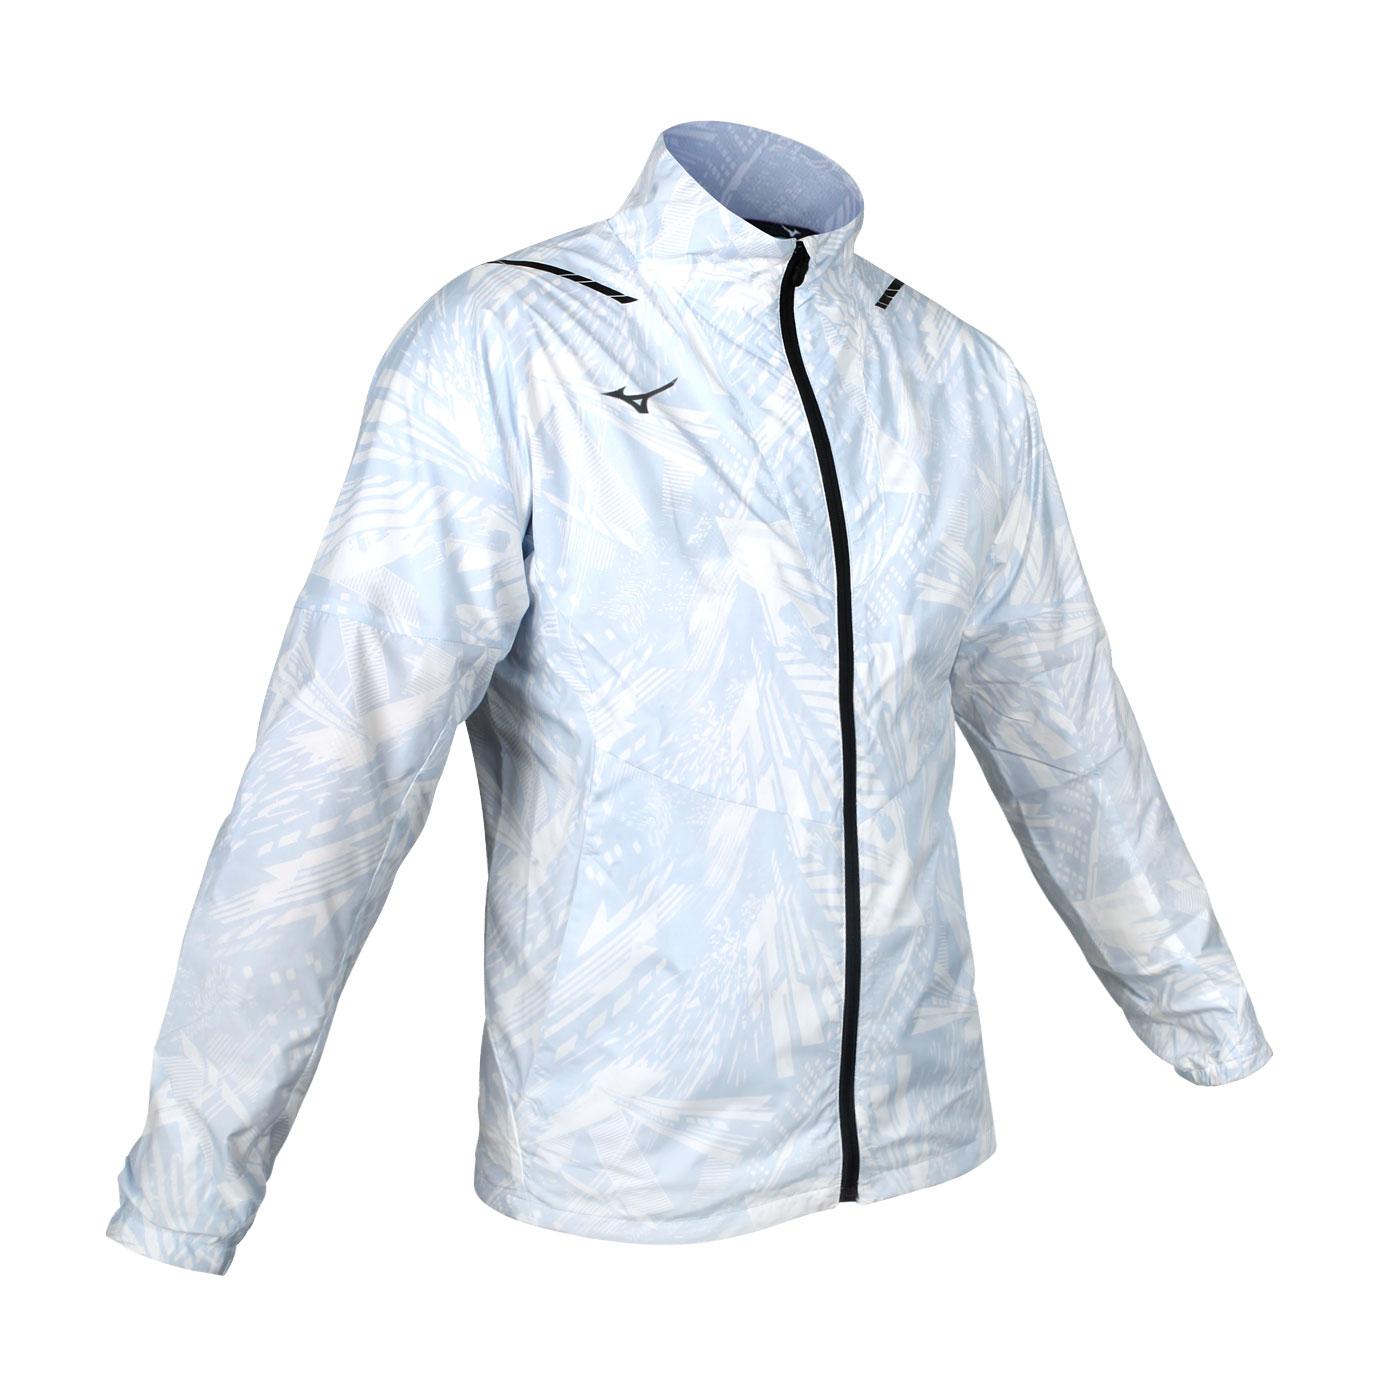 MIZUNO 男款平織運動外套 32ME051002 - 白淺藍黑